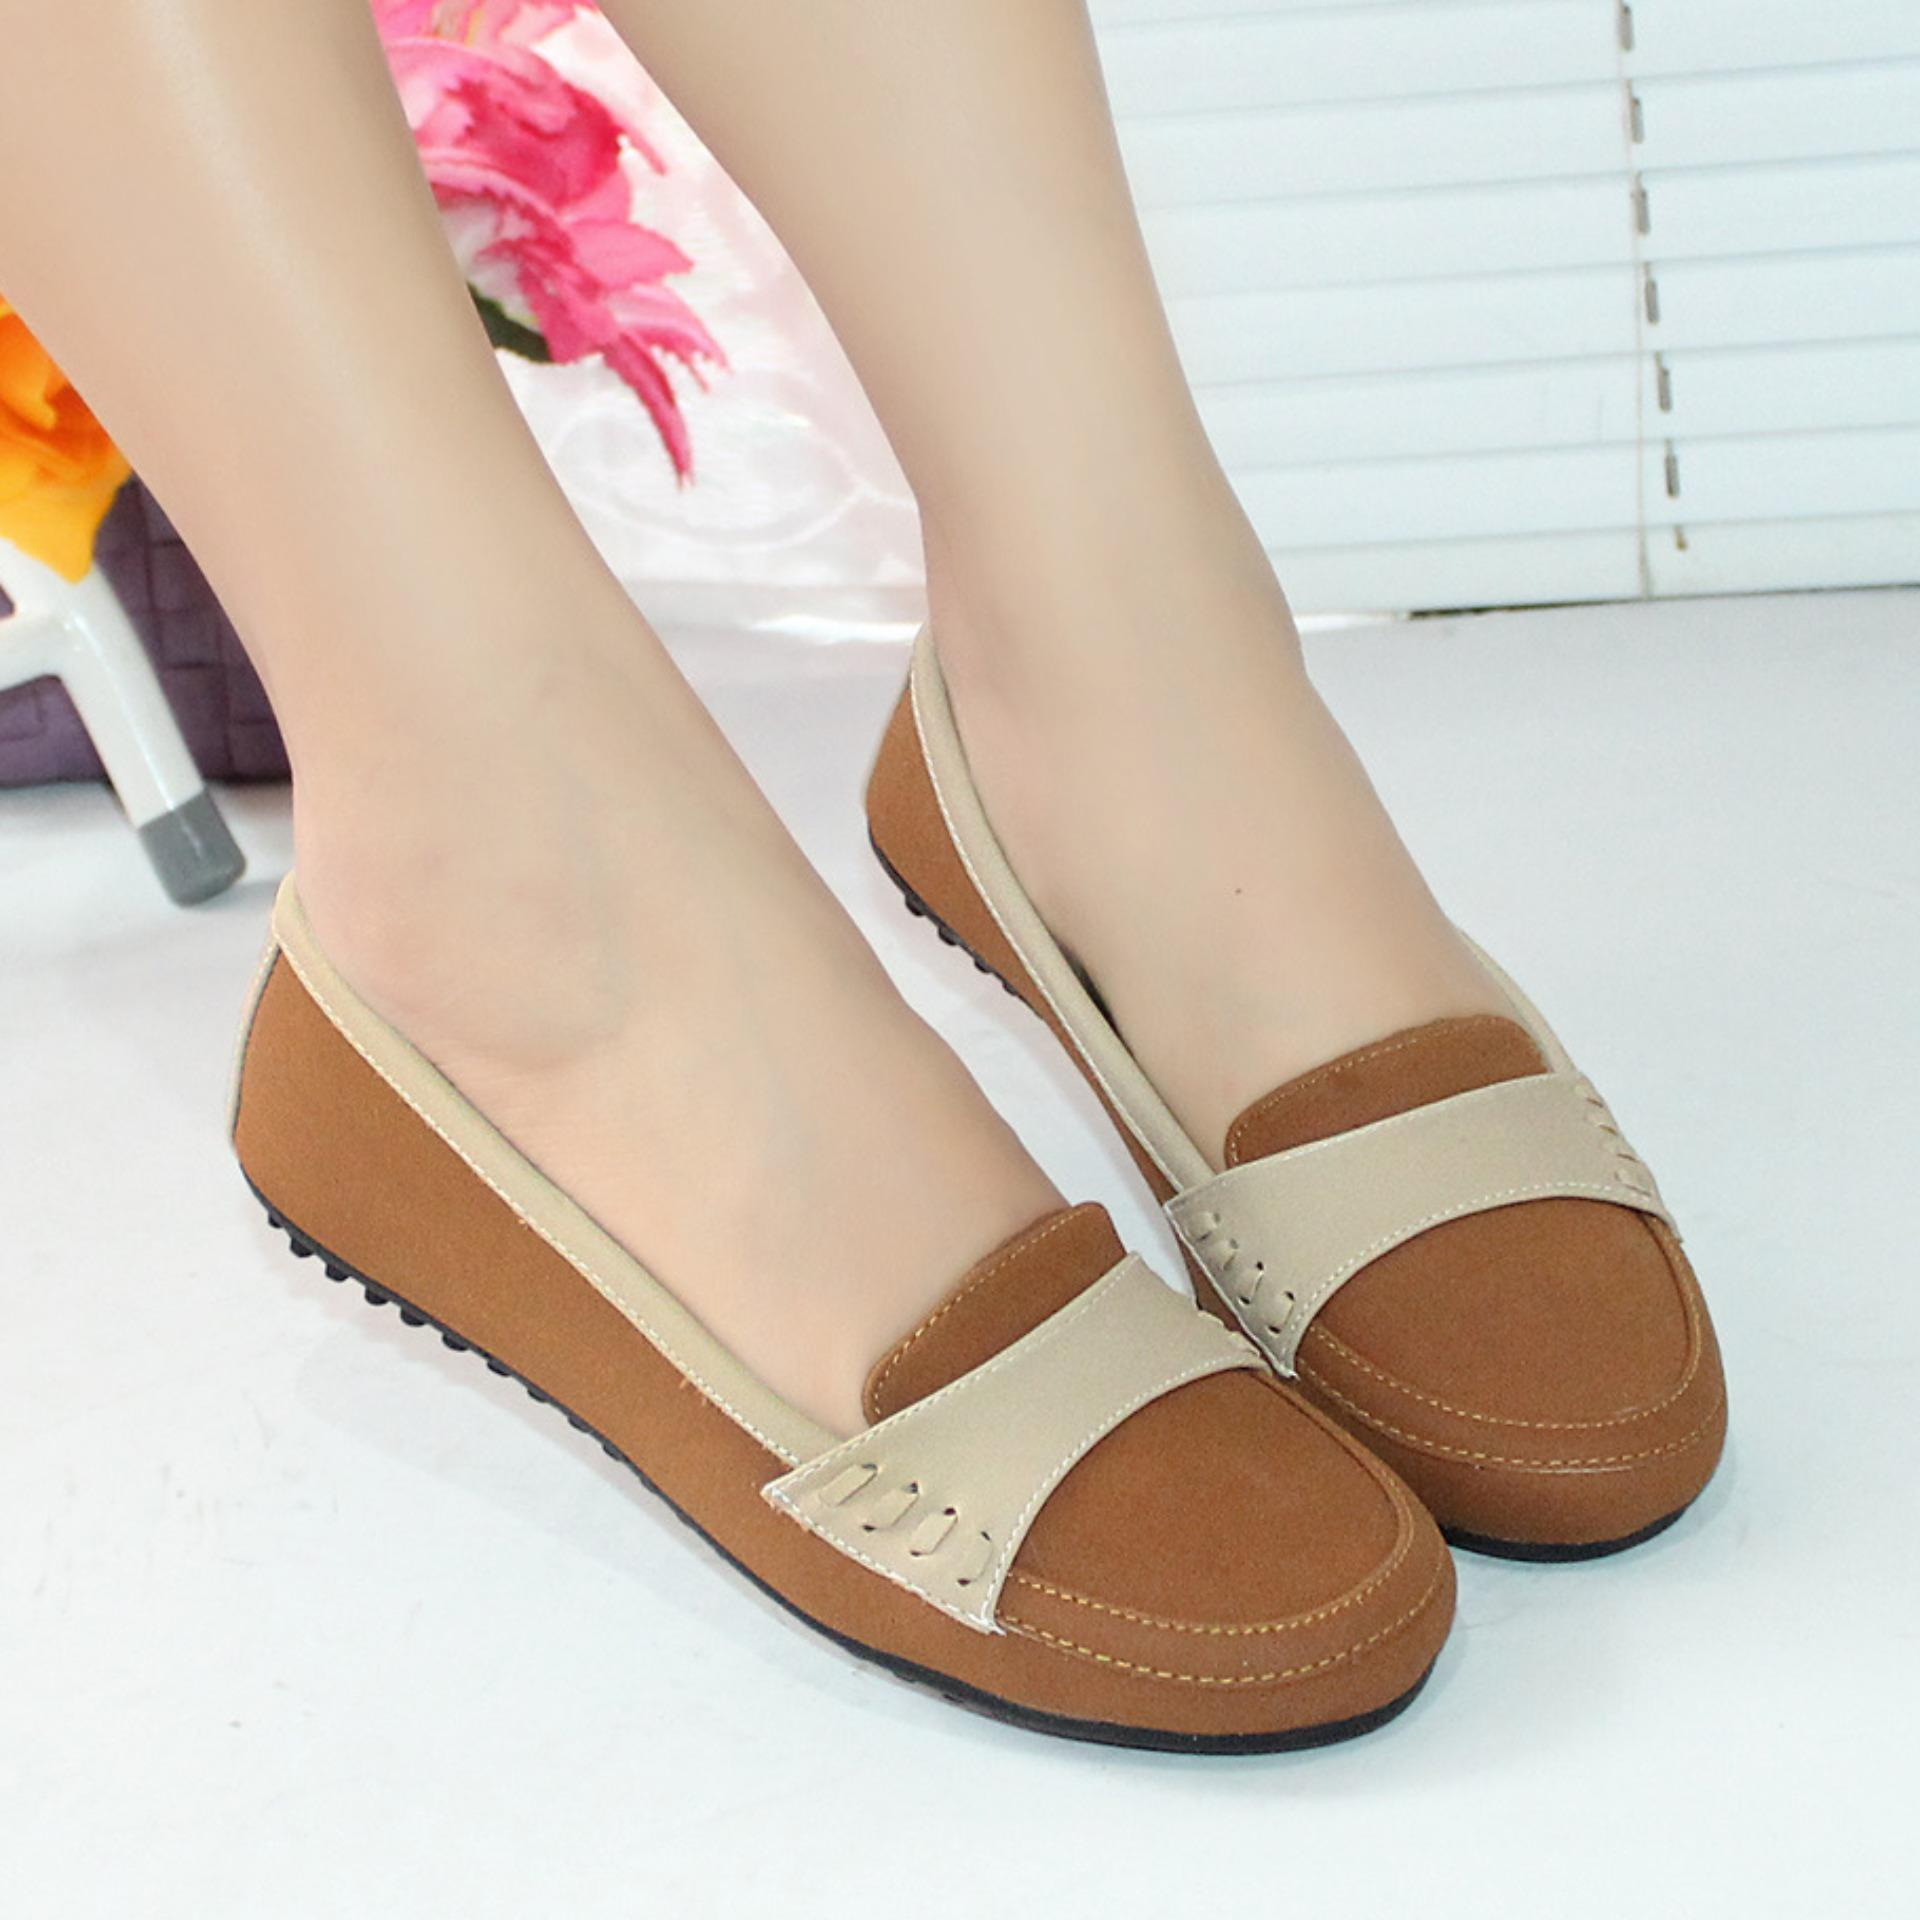 Beli Gratica Flatshoes Flat Shoes Nfz 20 Gratica Murah